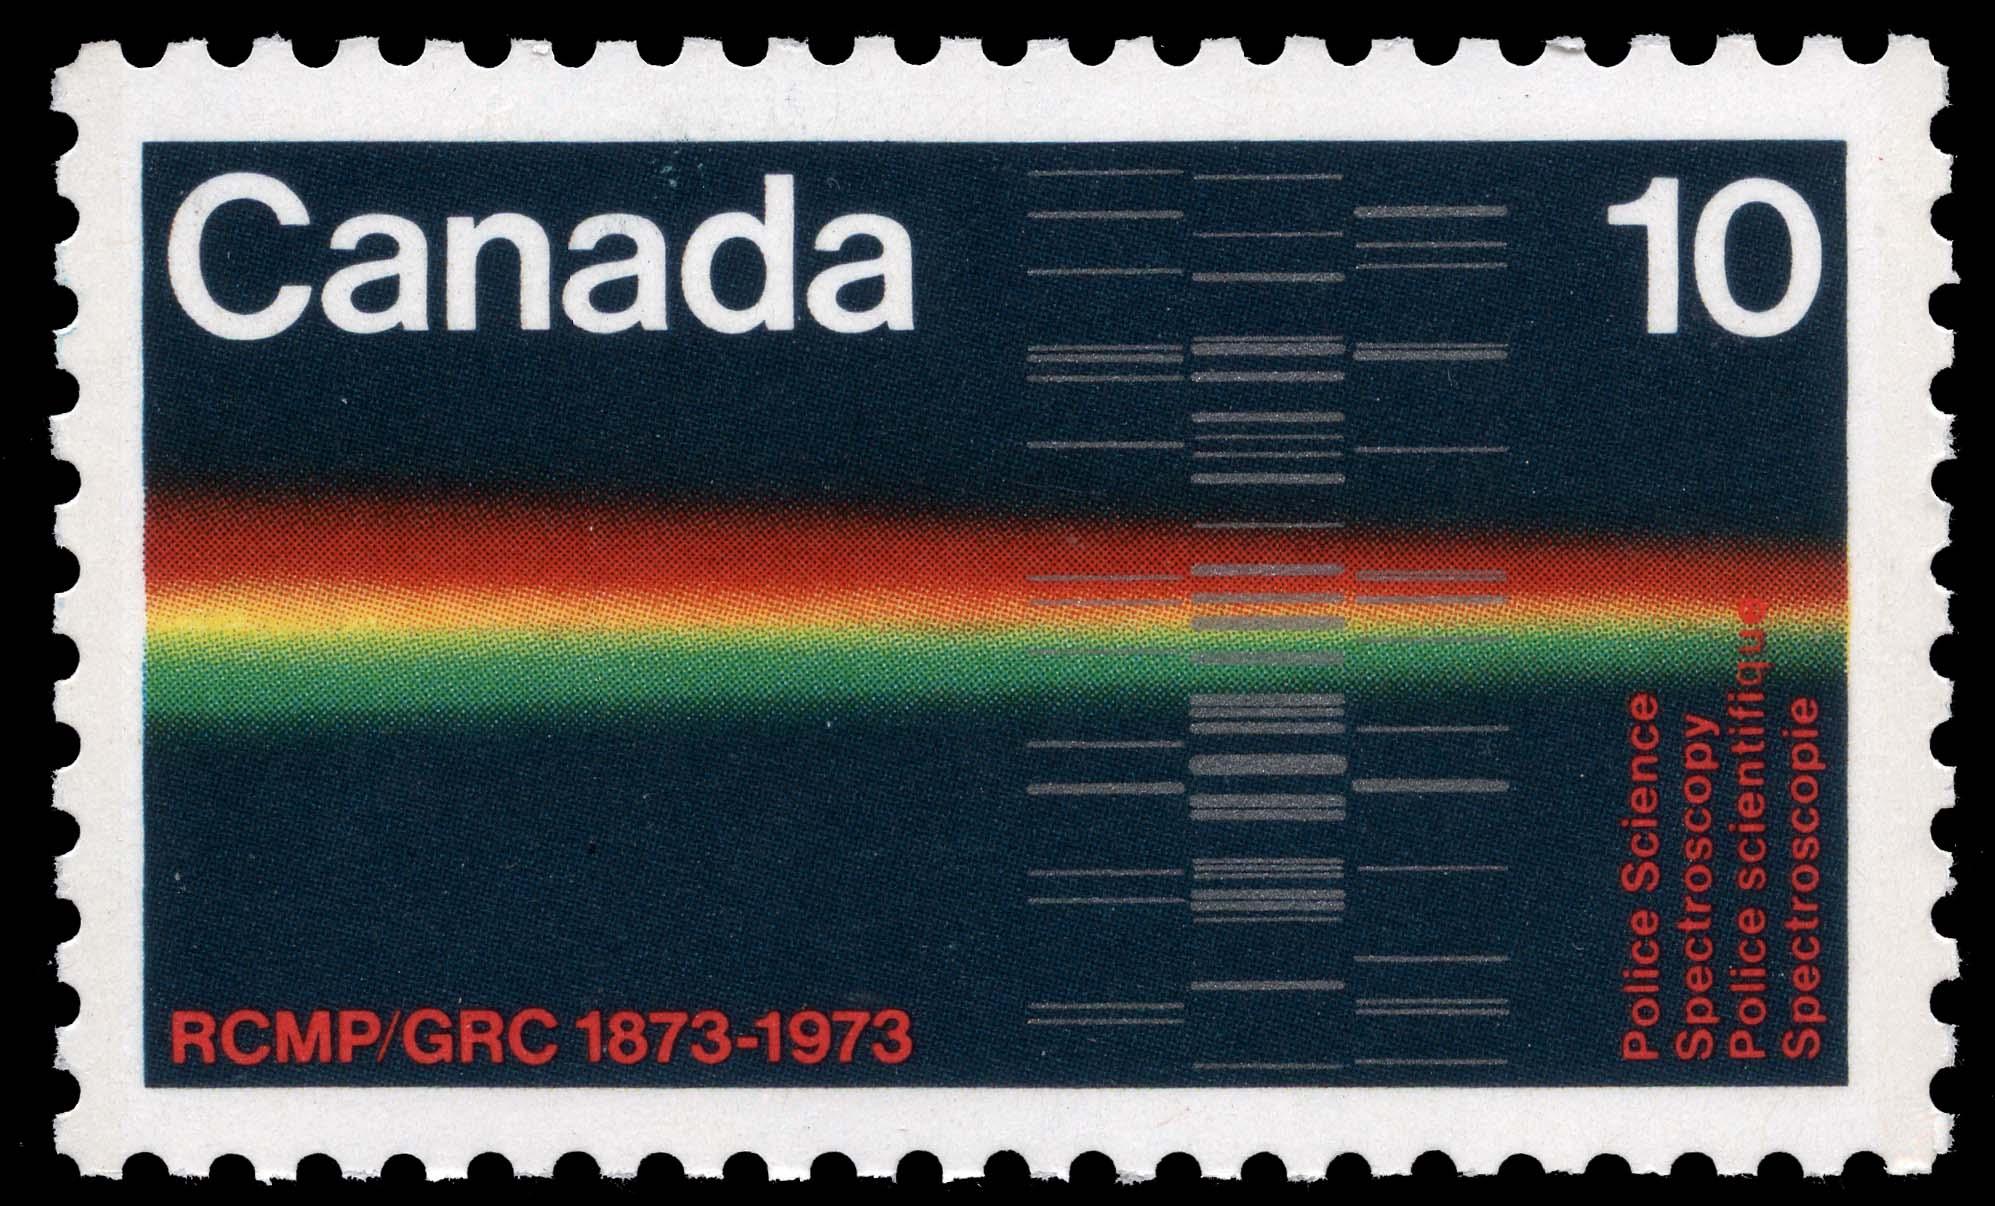 Police Science, Spectroscopy Canada Postage Stamp